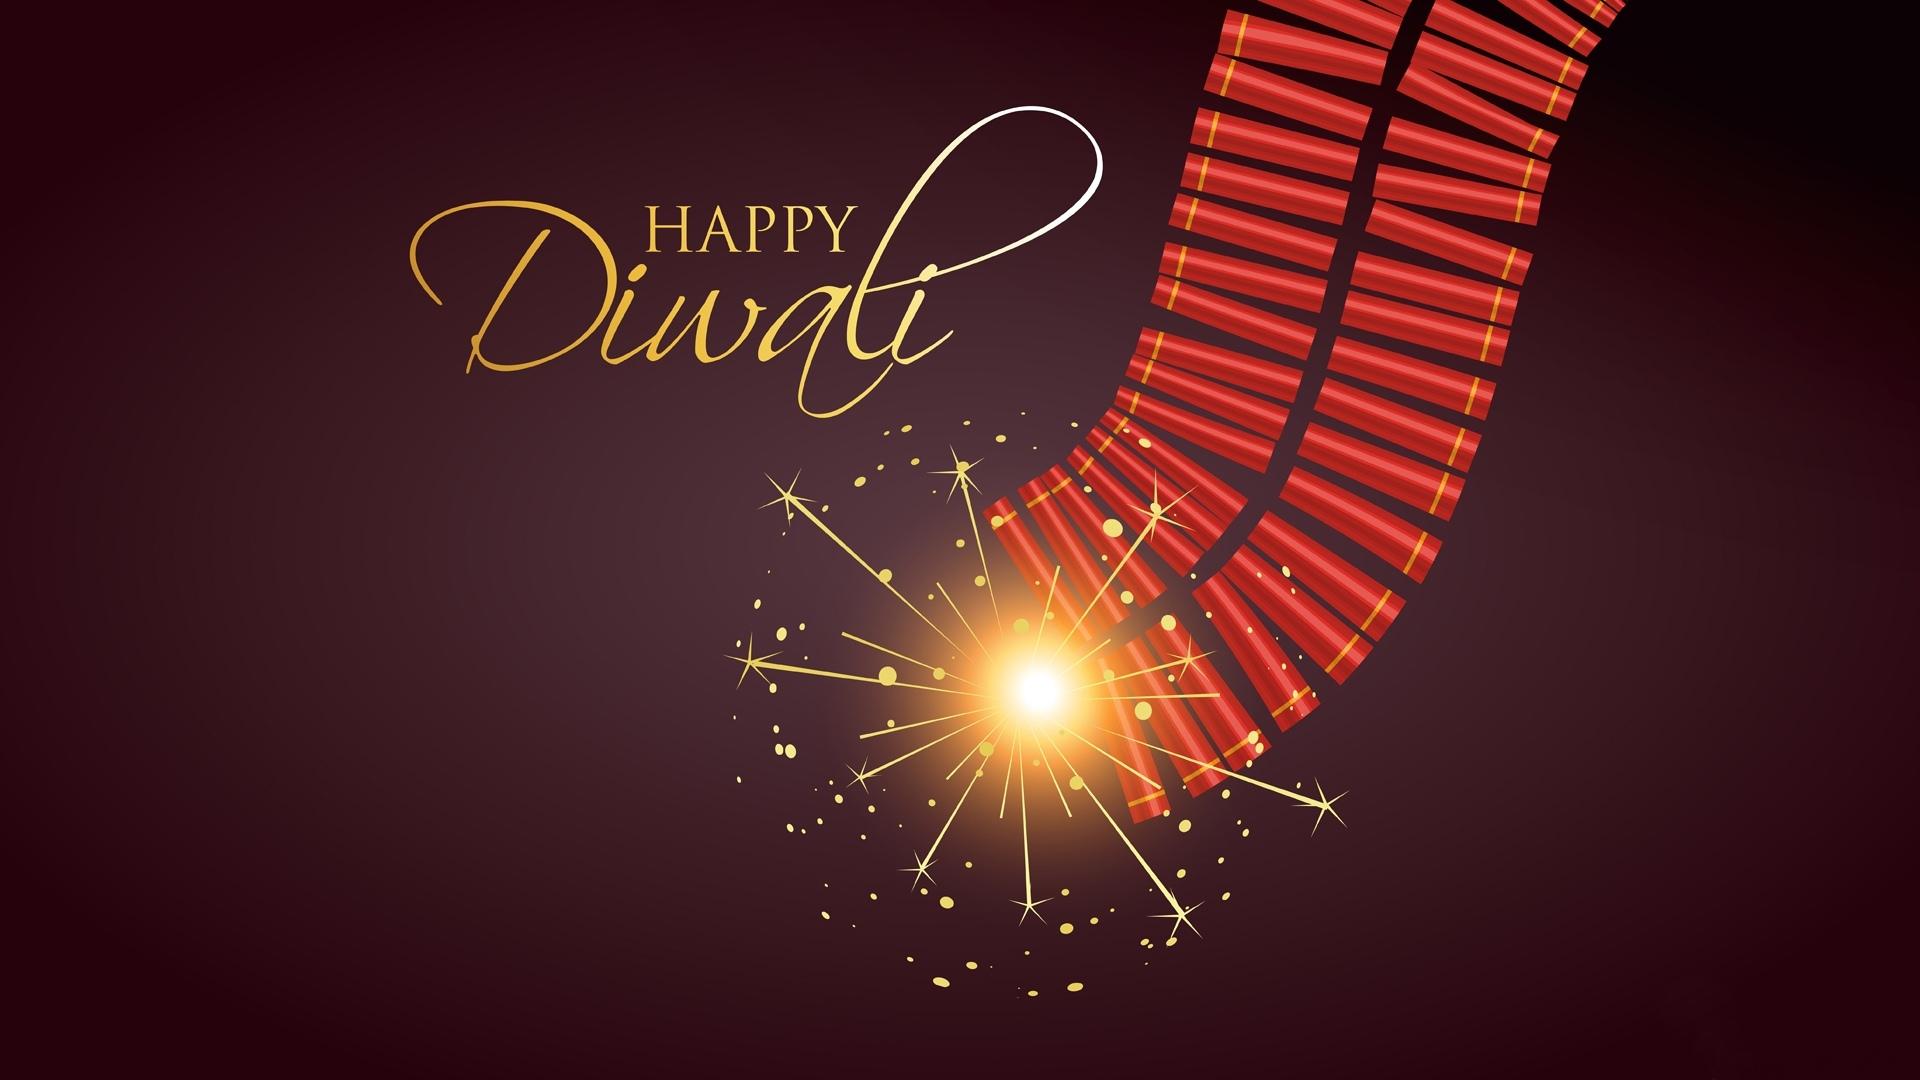 Diwali fireworks picture